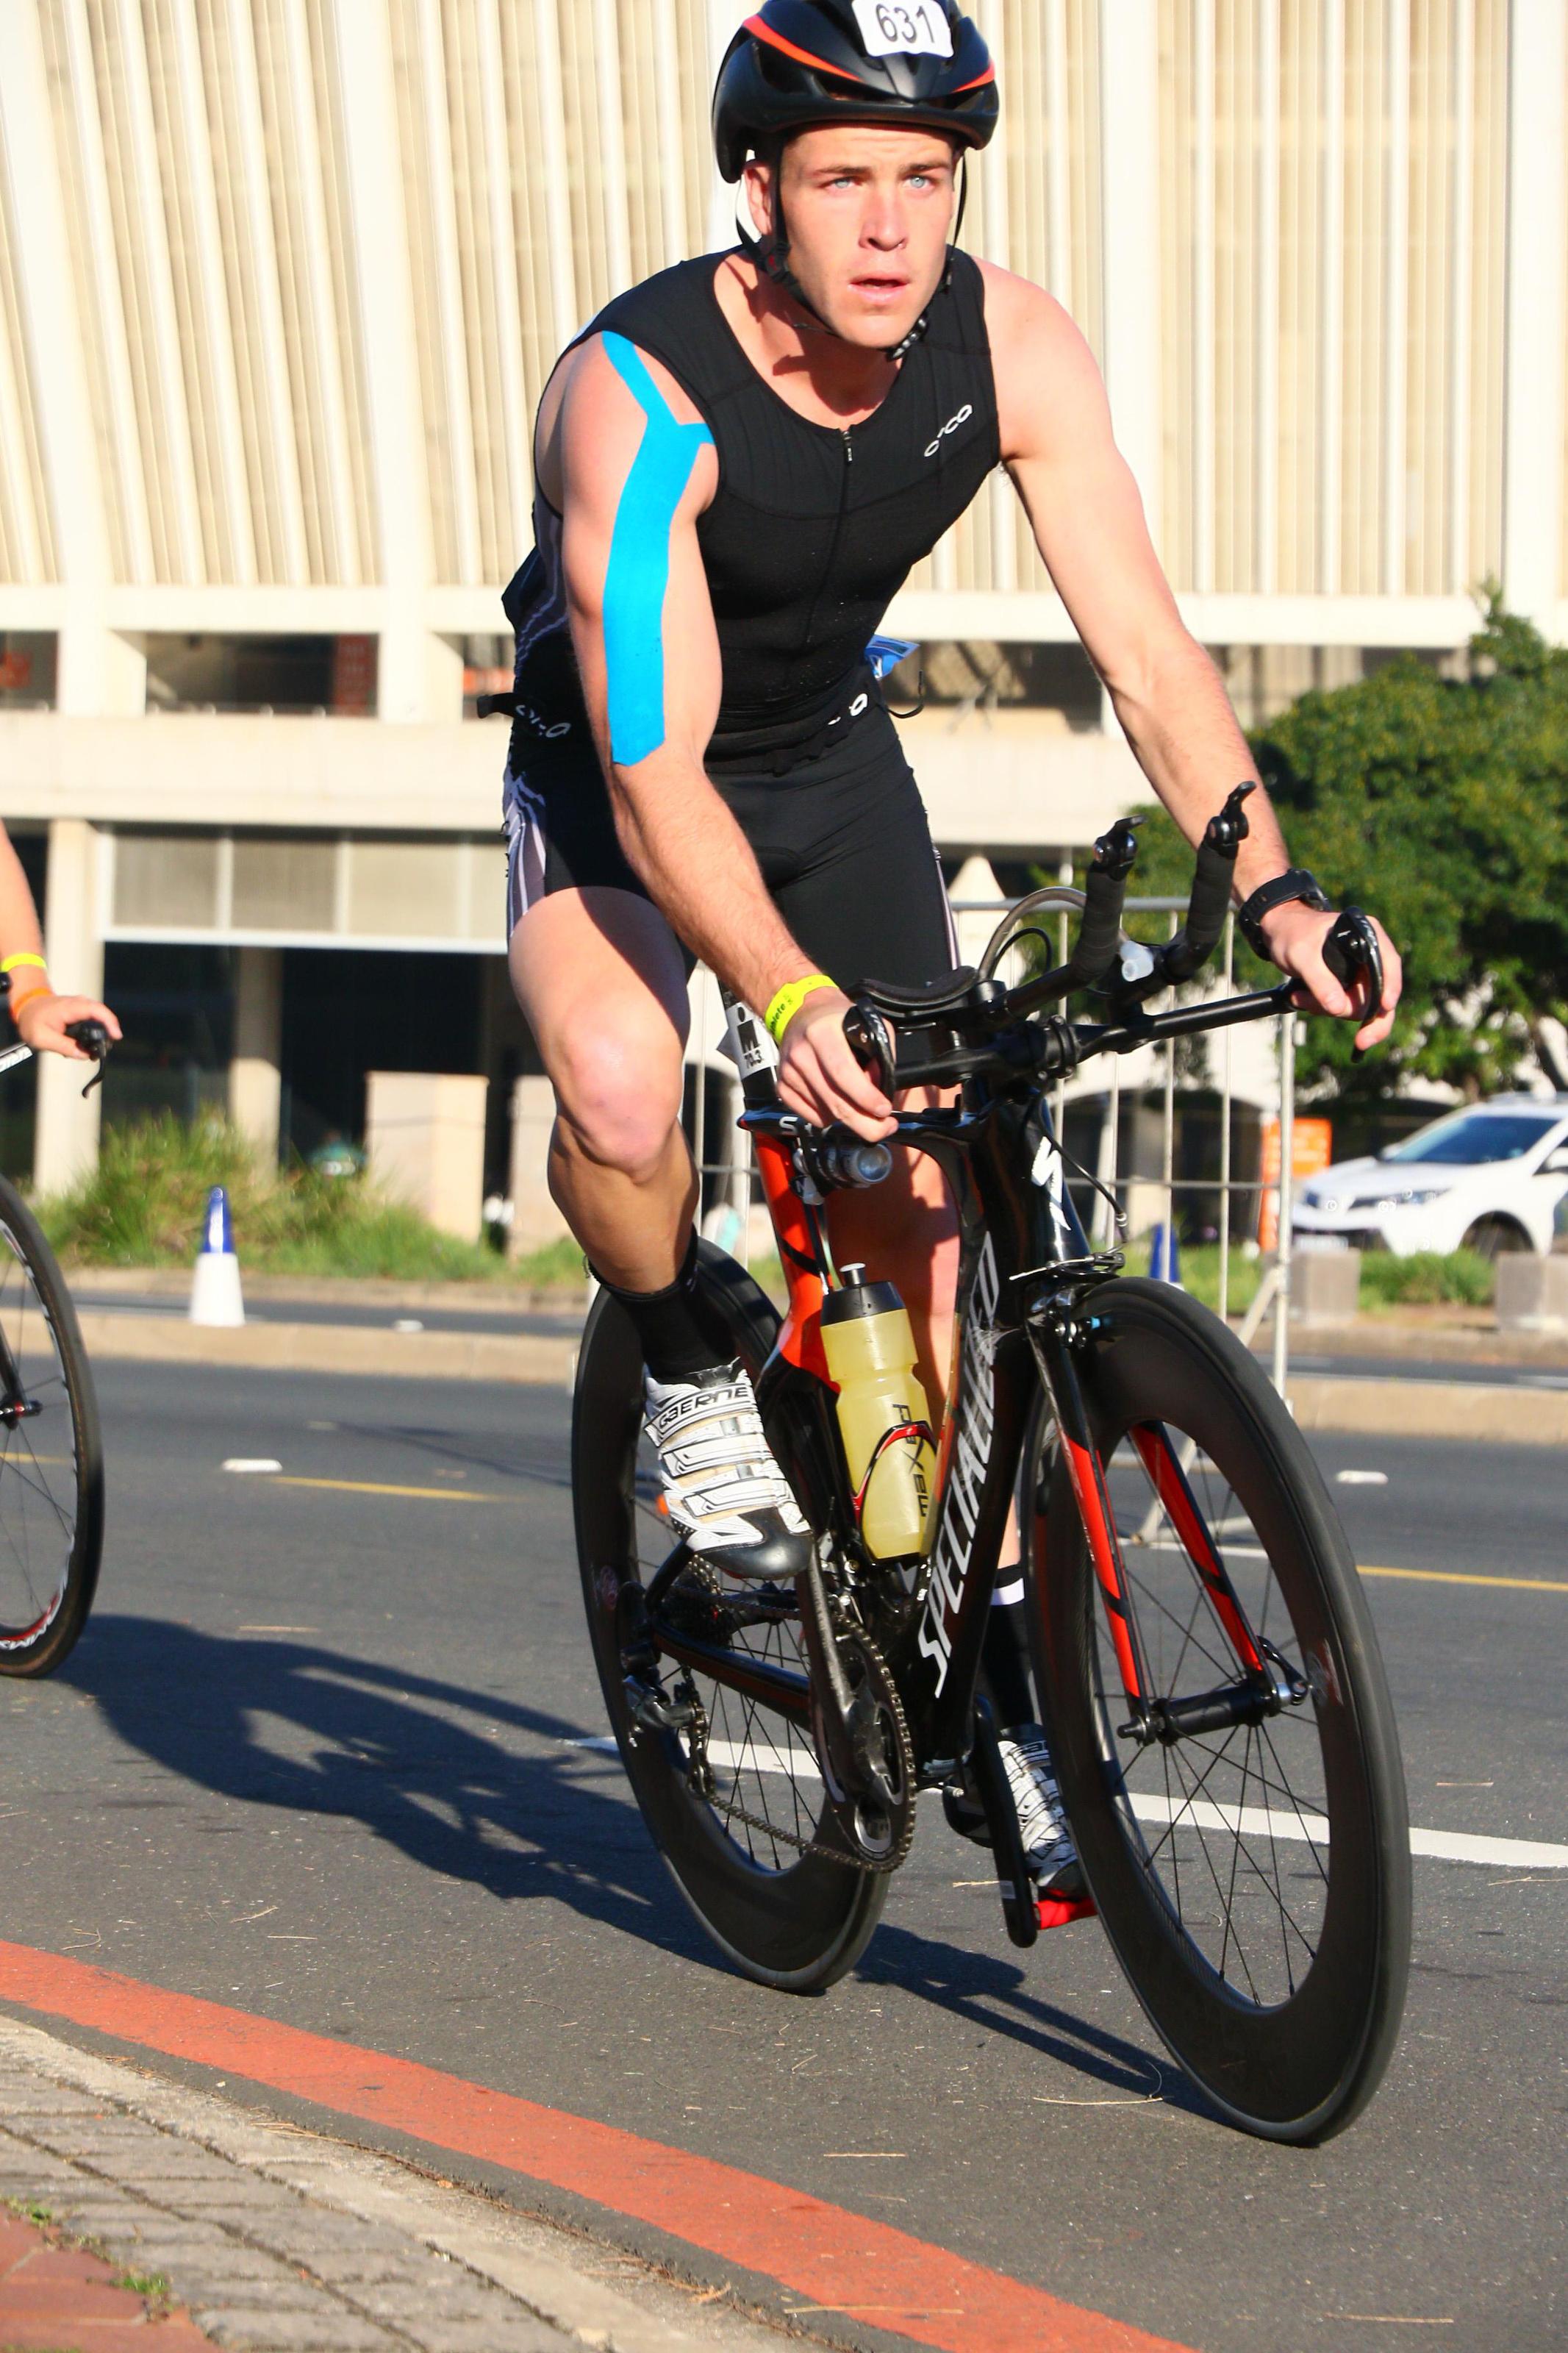 james cycling during a triathlon